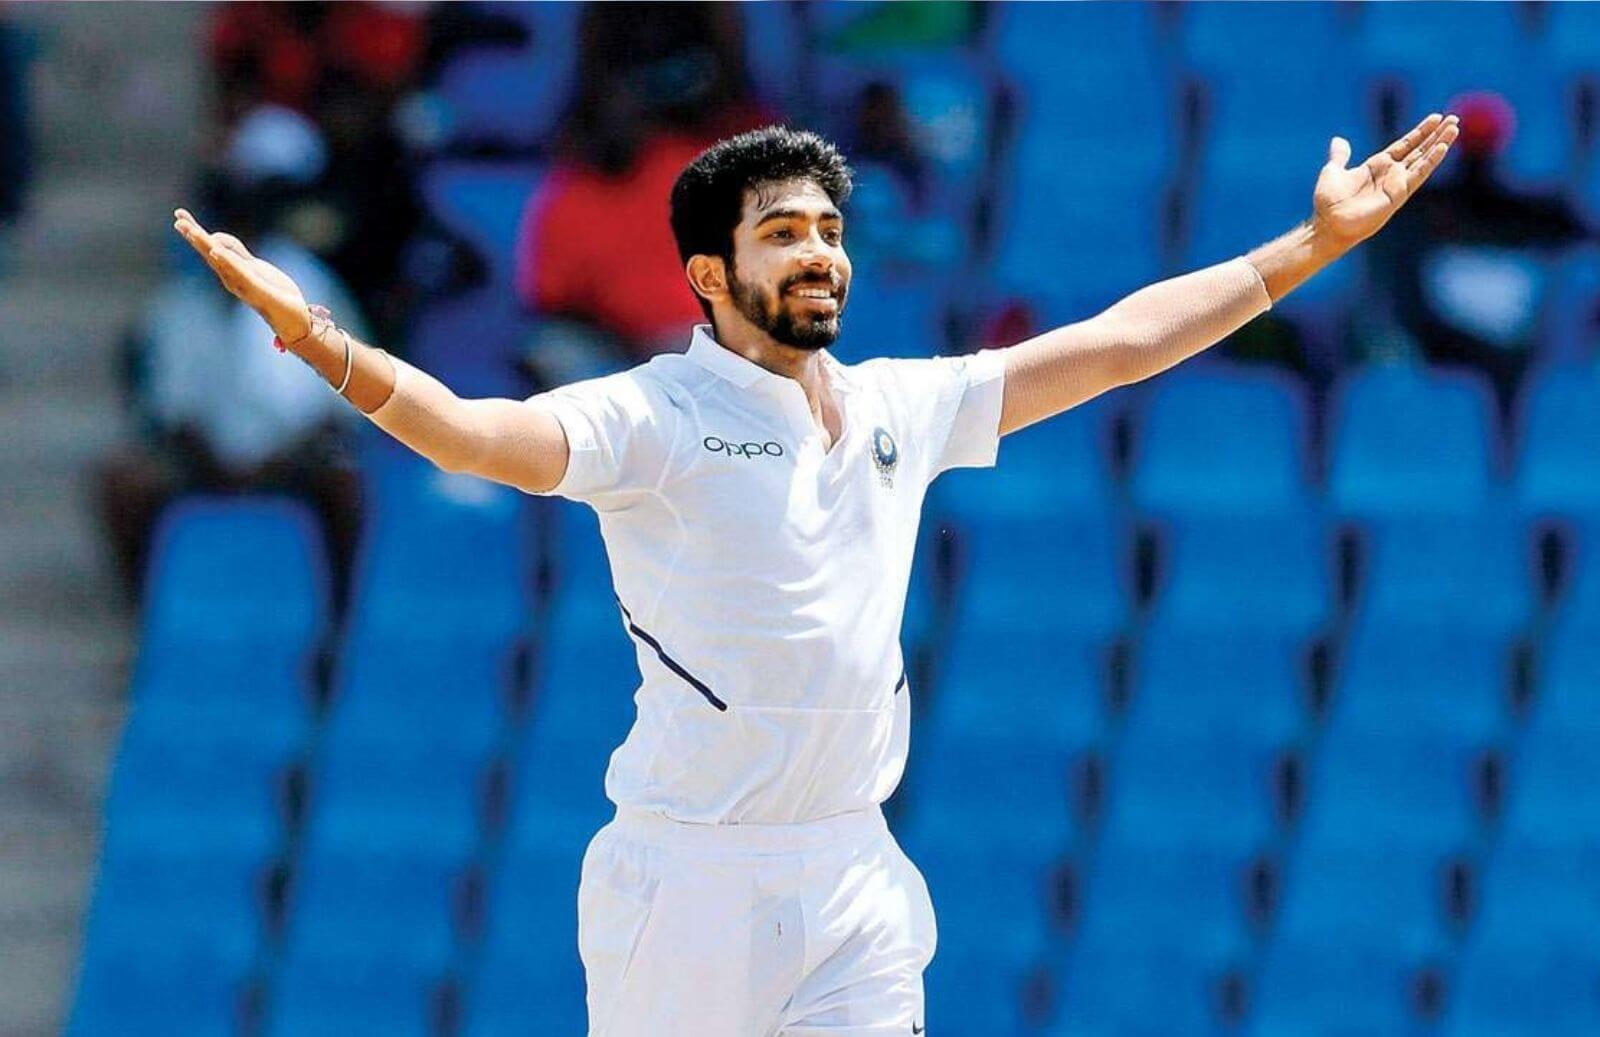 Watch_ Jasprit Bumrah Hilariously Imitates Steve Smith On His Follow-Through During 3rd Test